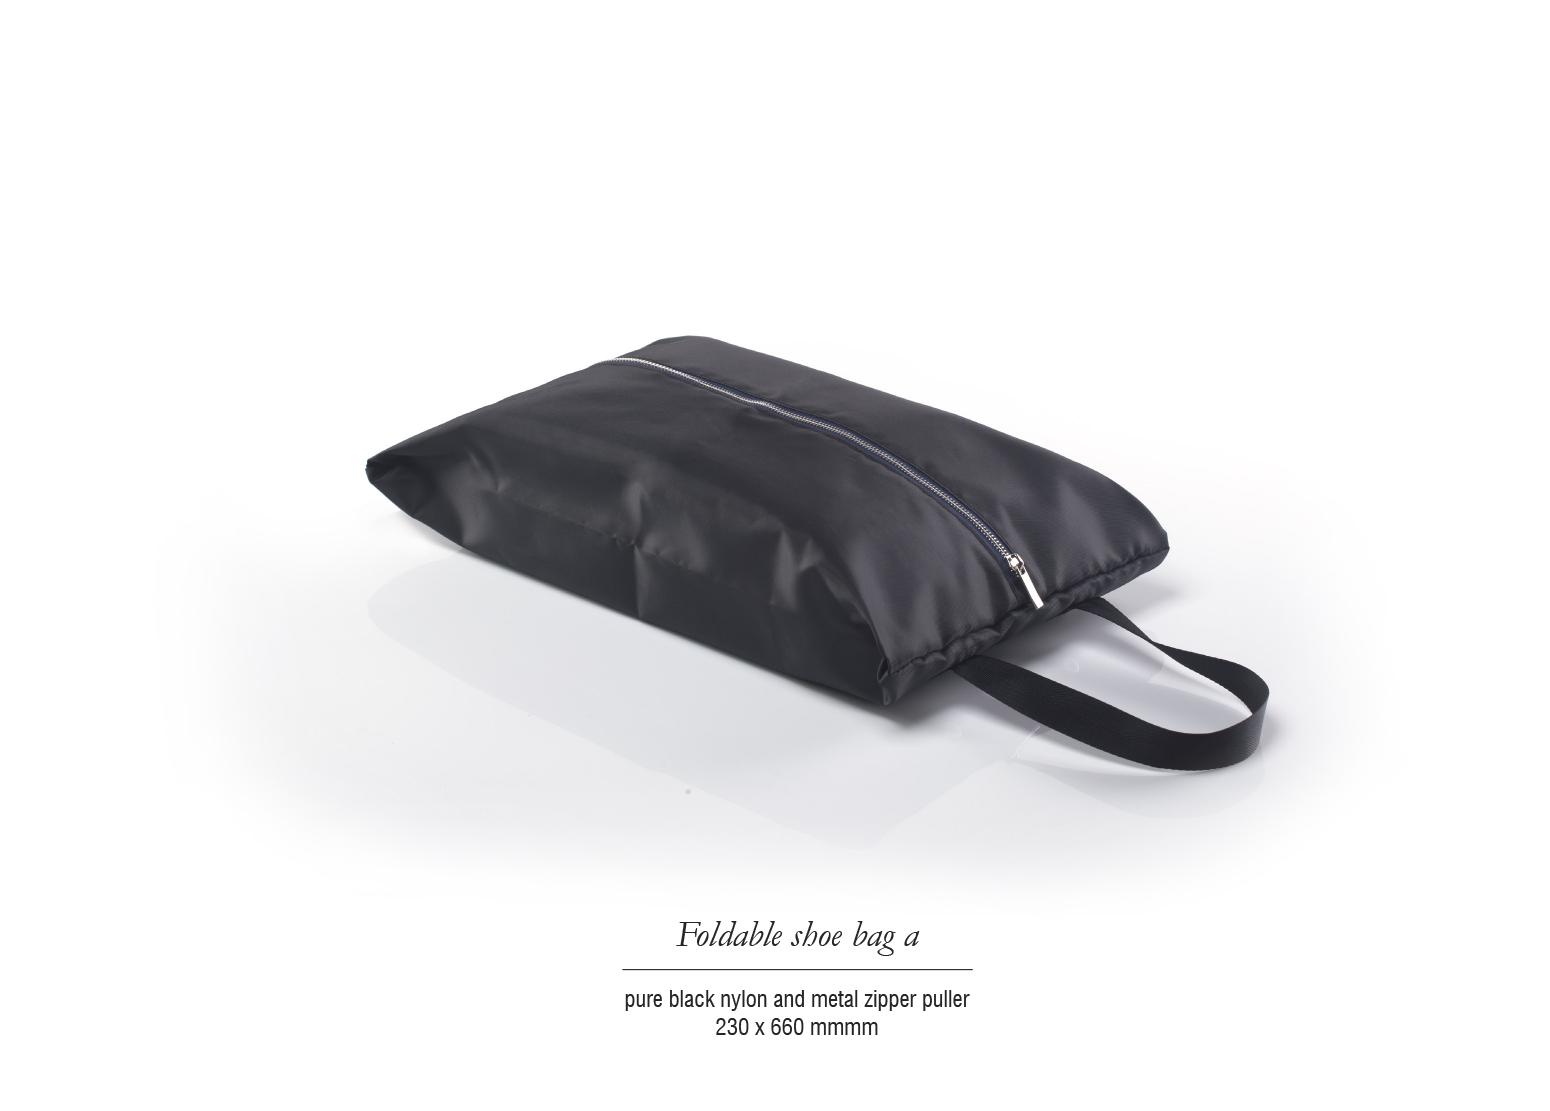 Amenity bags catalogue 2016_SHcollection_V6 108.jpg